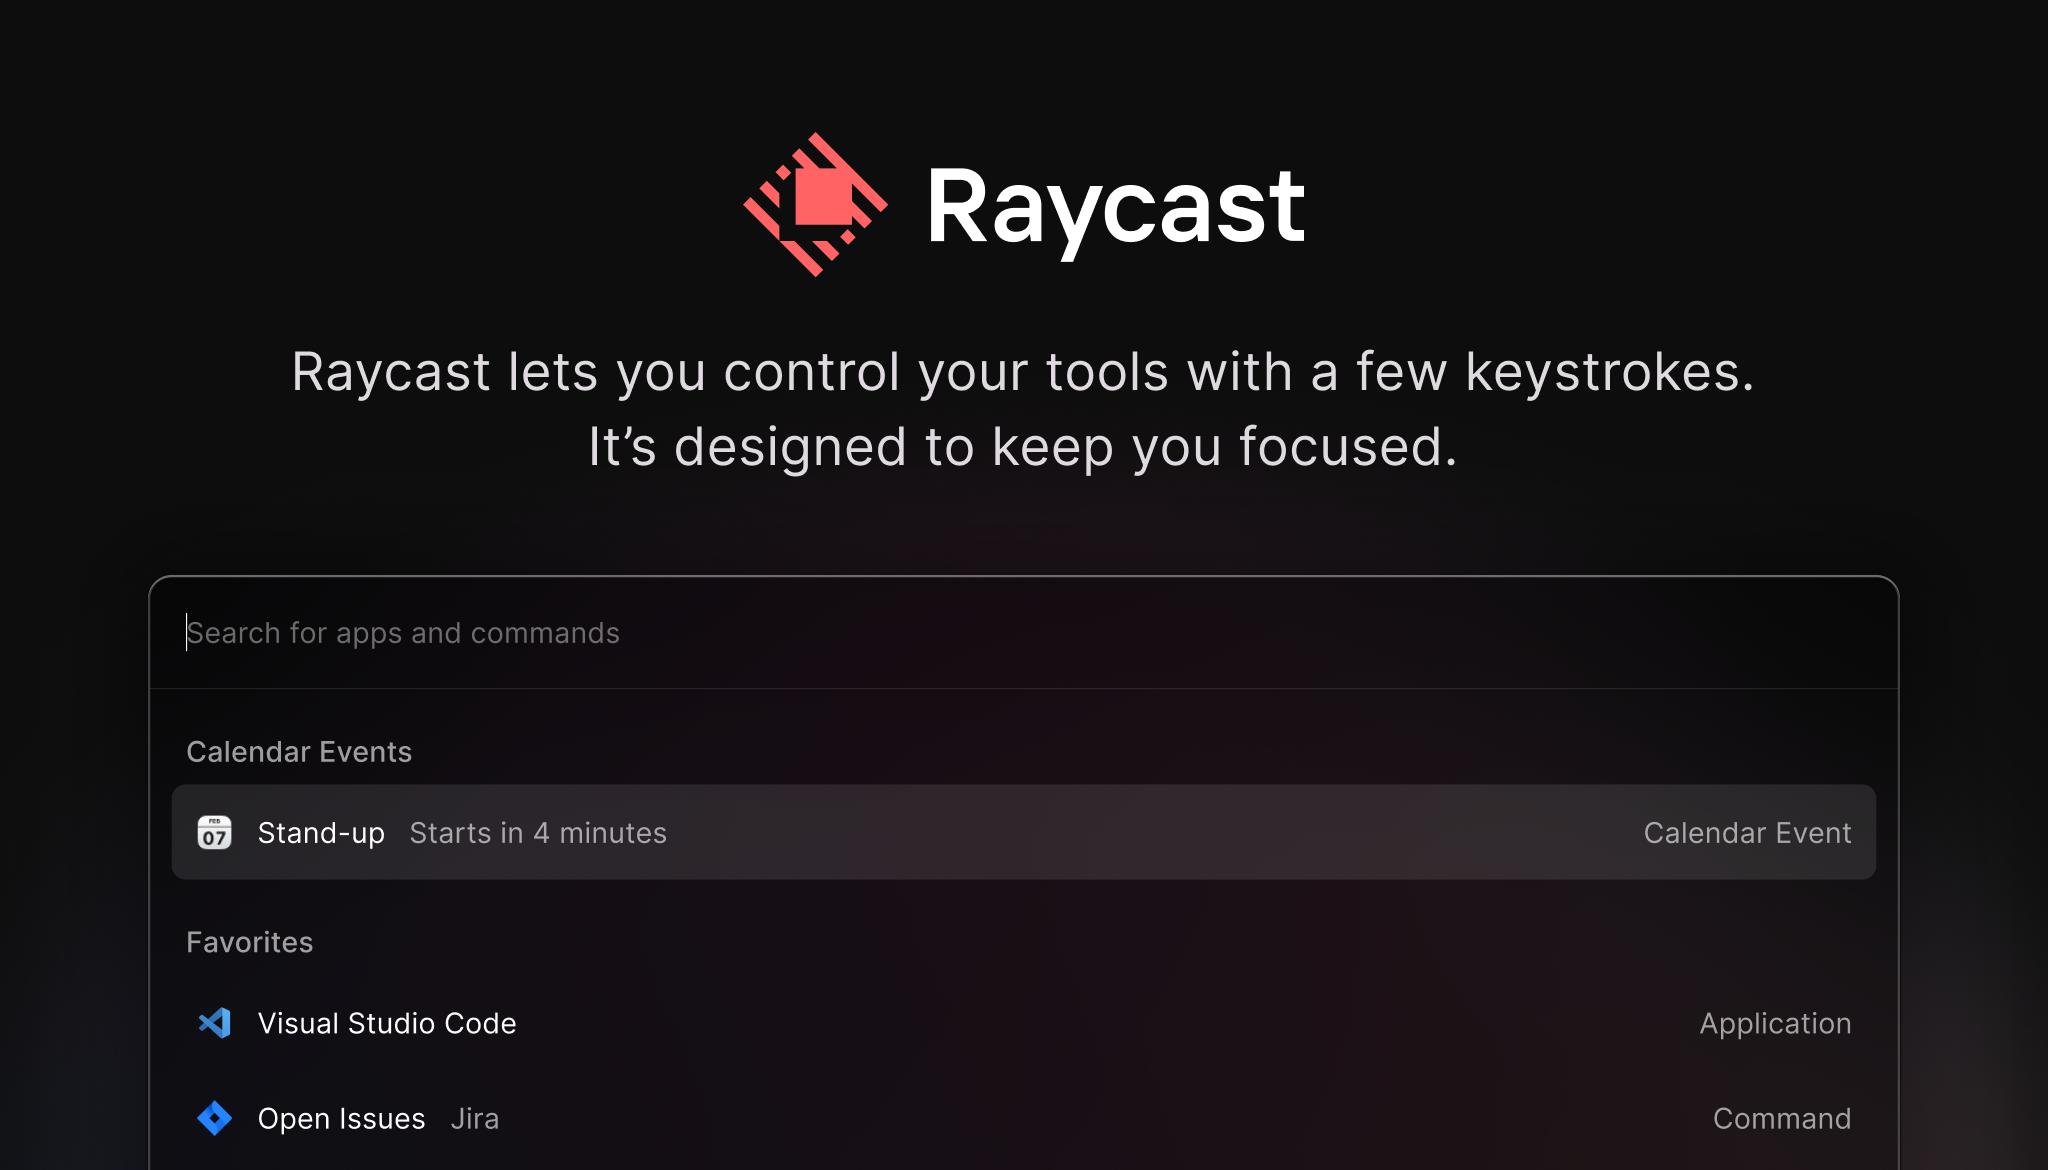 Raycast (YC W20) Is Hiring Fullstack Software Engineers (EU, Remote)